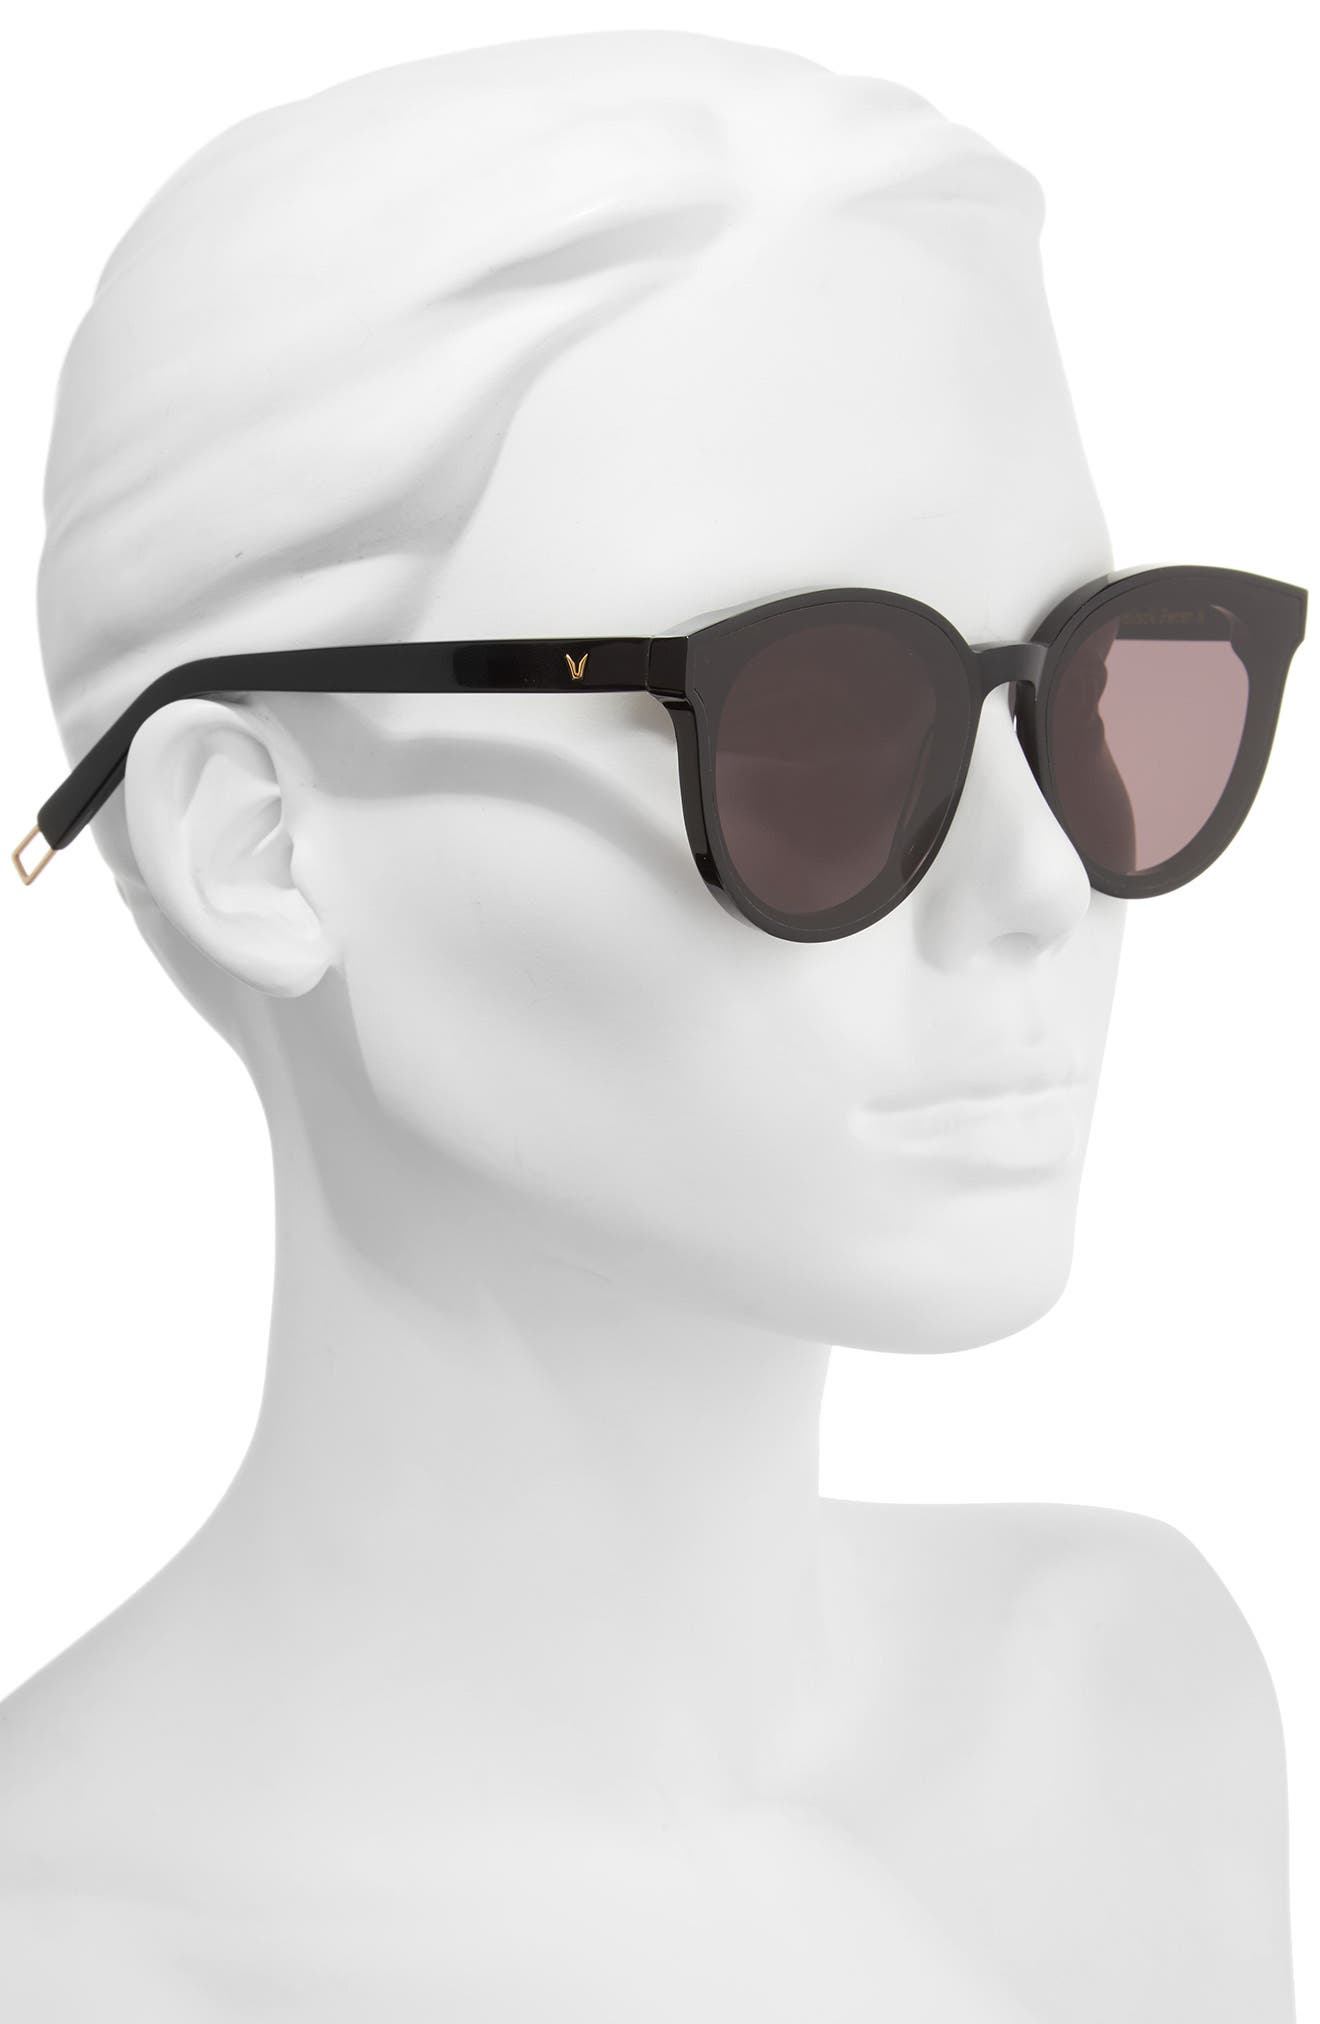 Black Peter 61mm Rounded Sunglasses,                             Alternate thumbnail 2, color,                             001